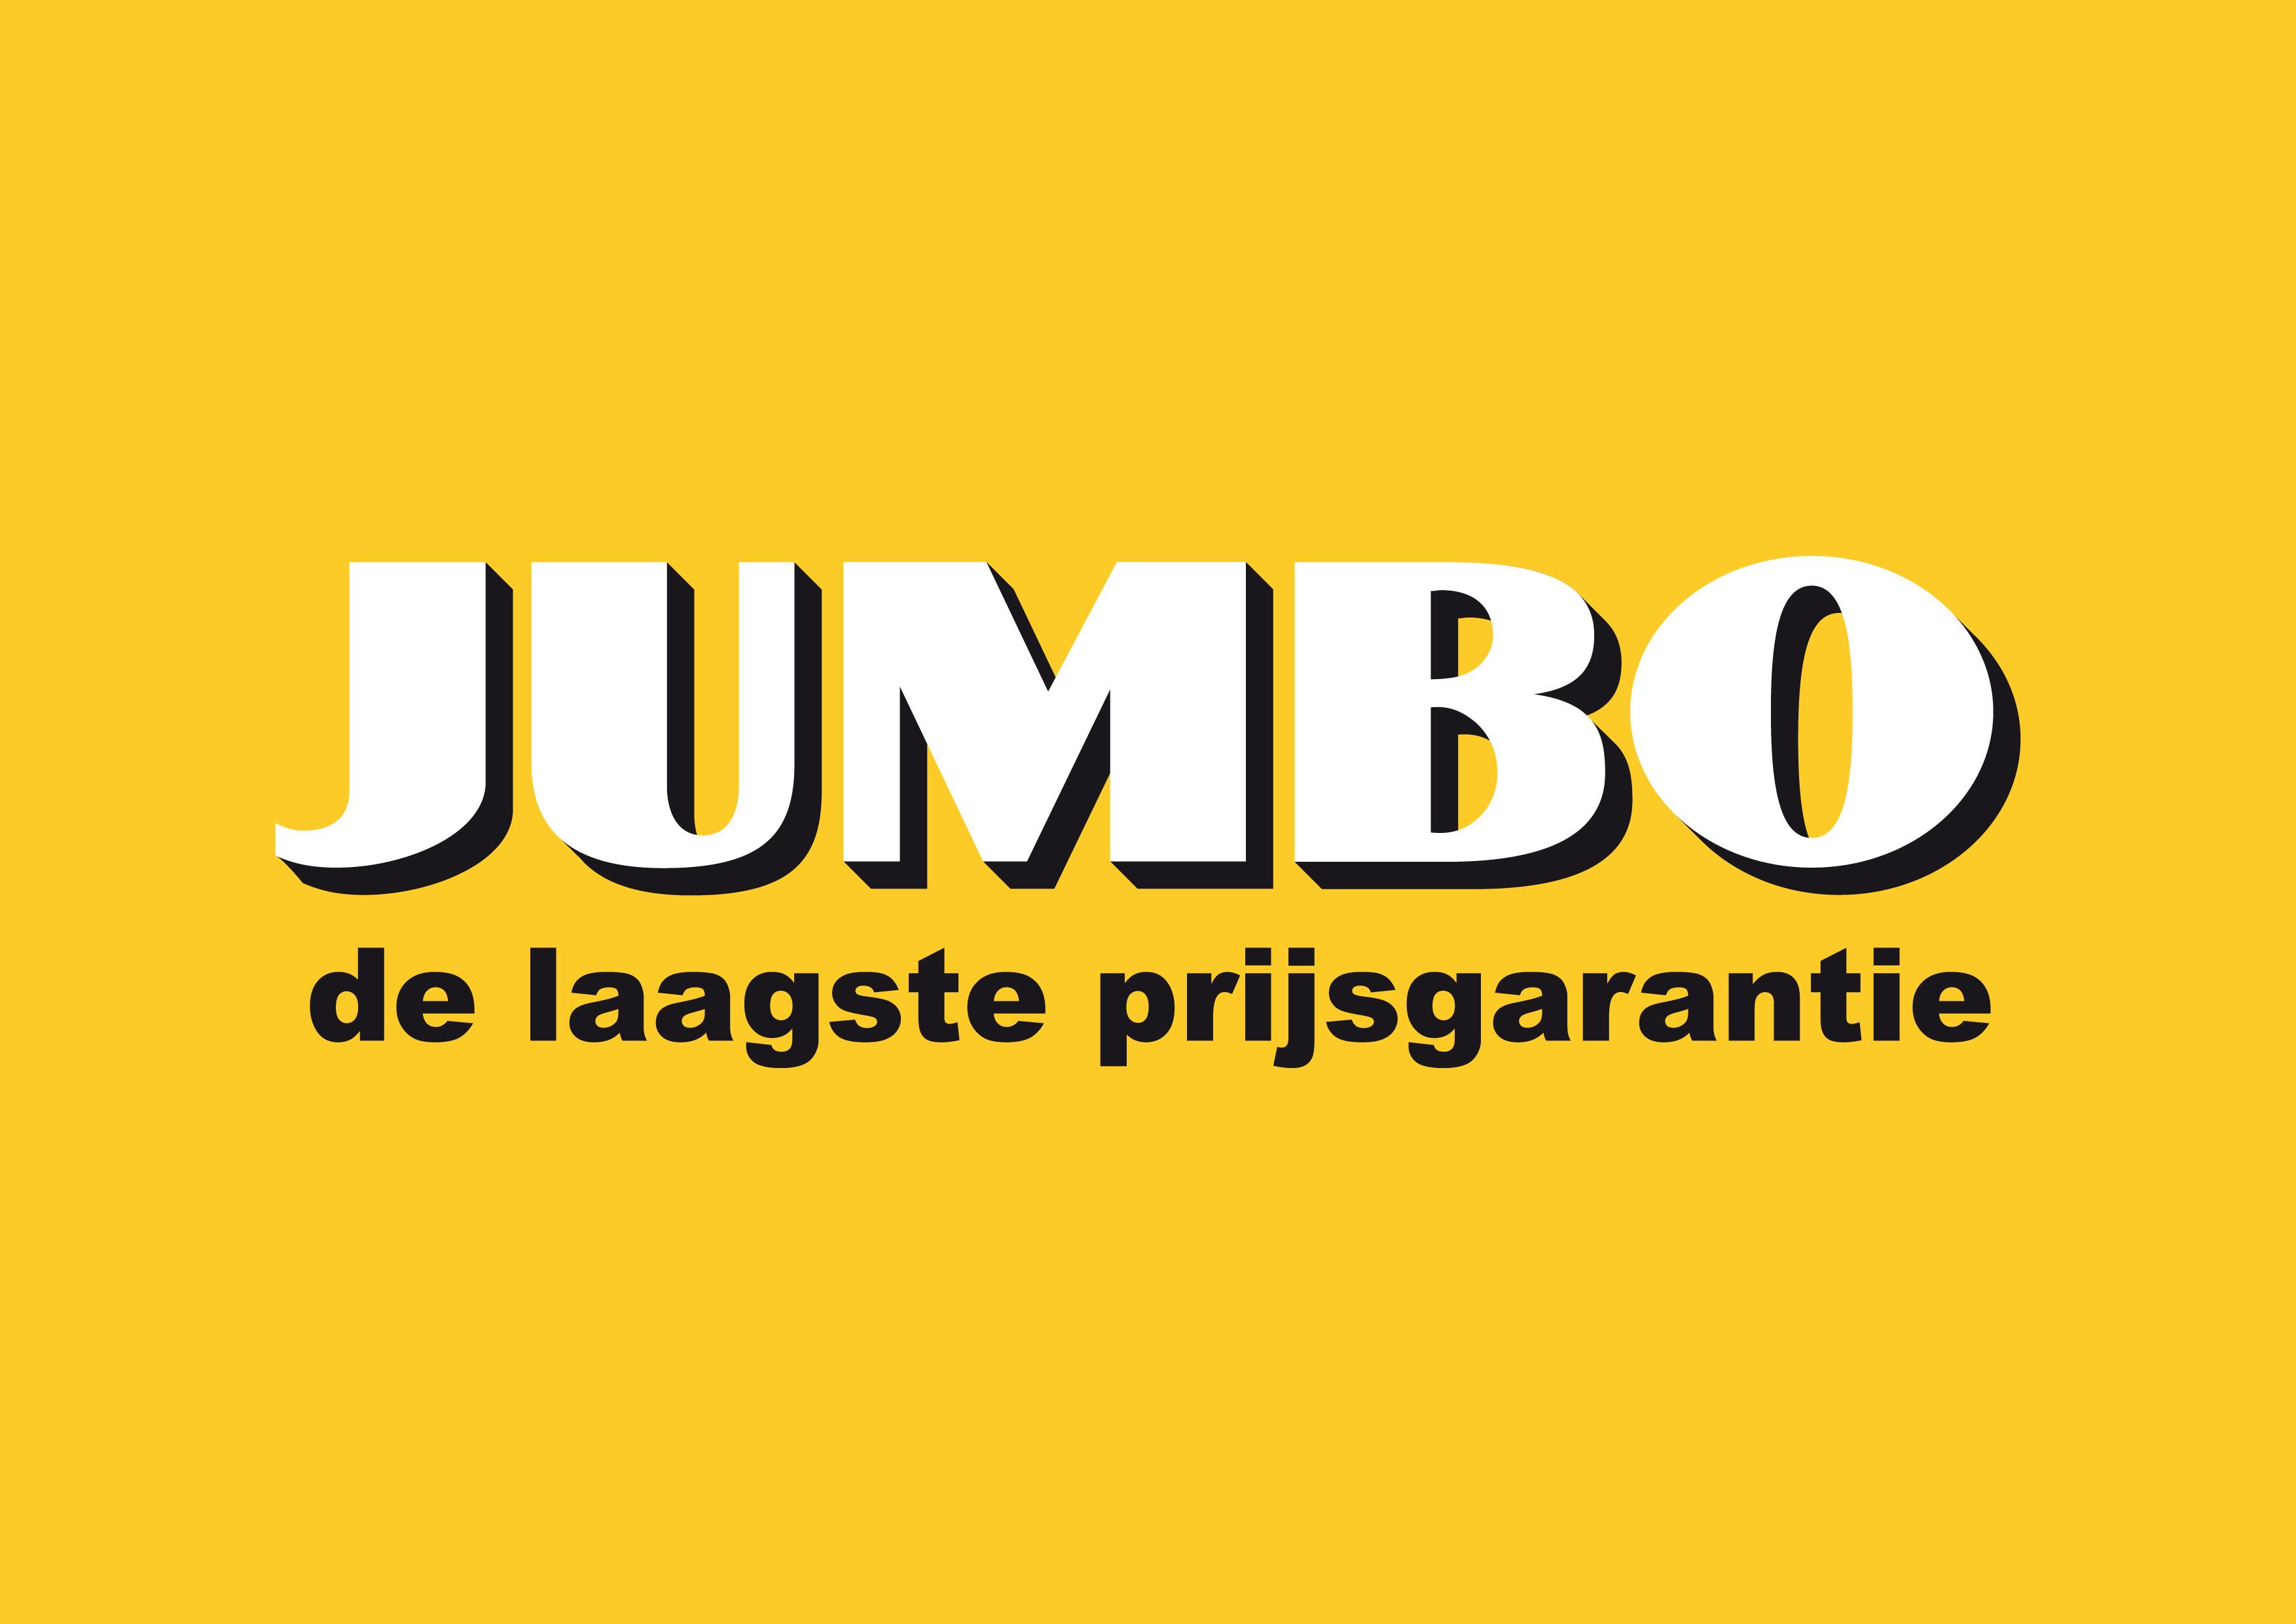 logo-jumbo-2012.cdr